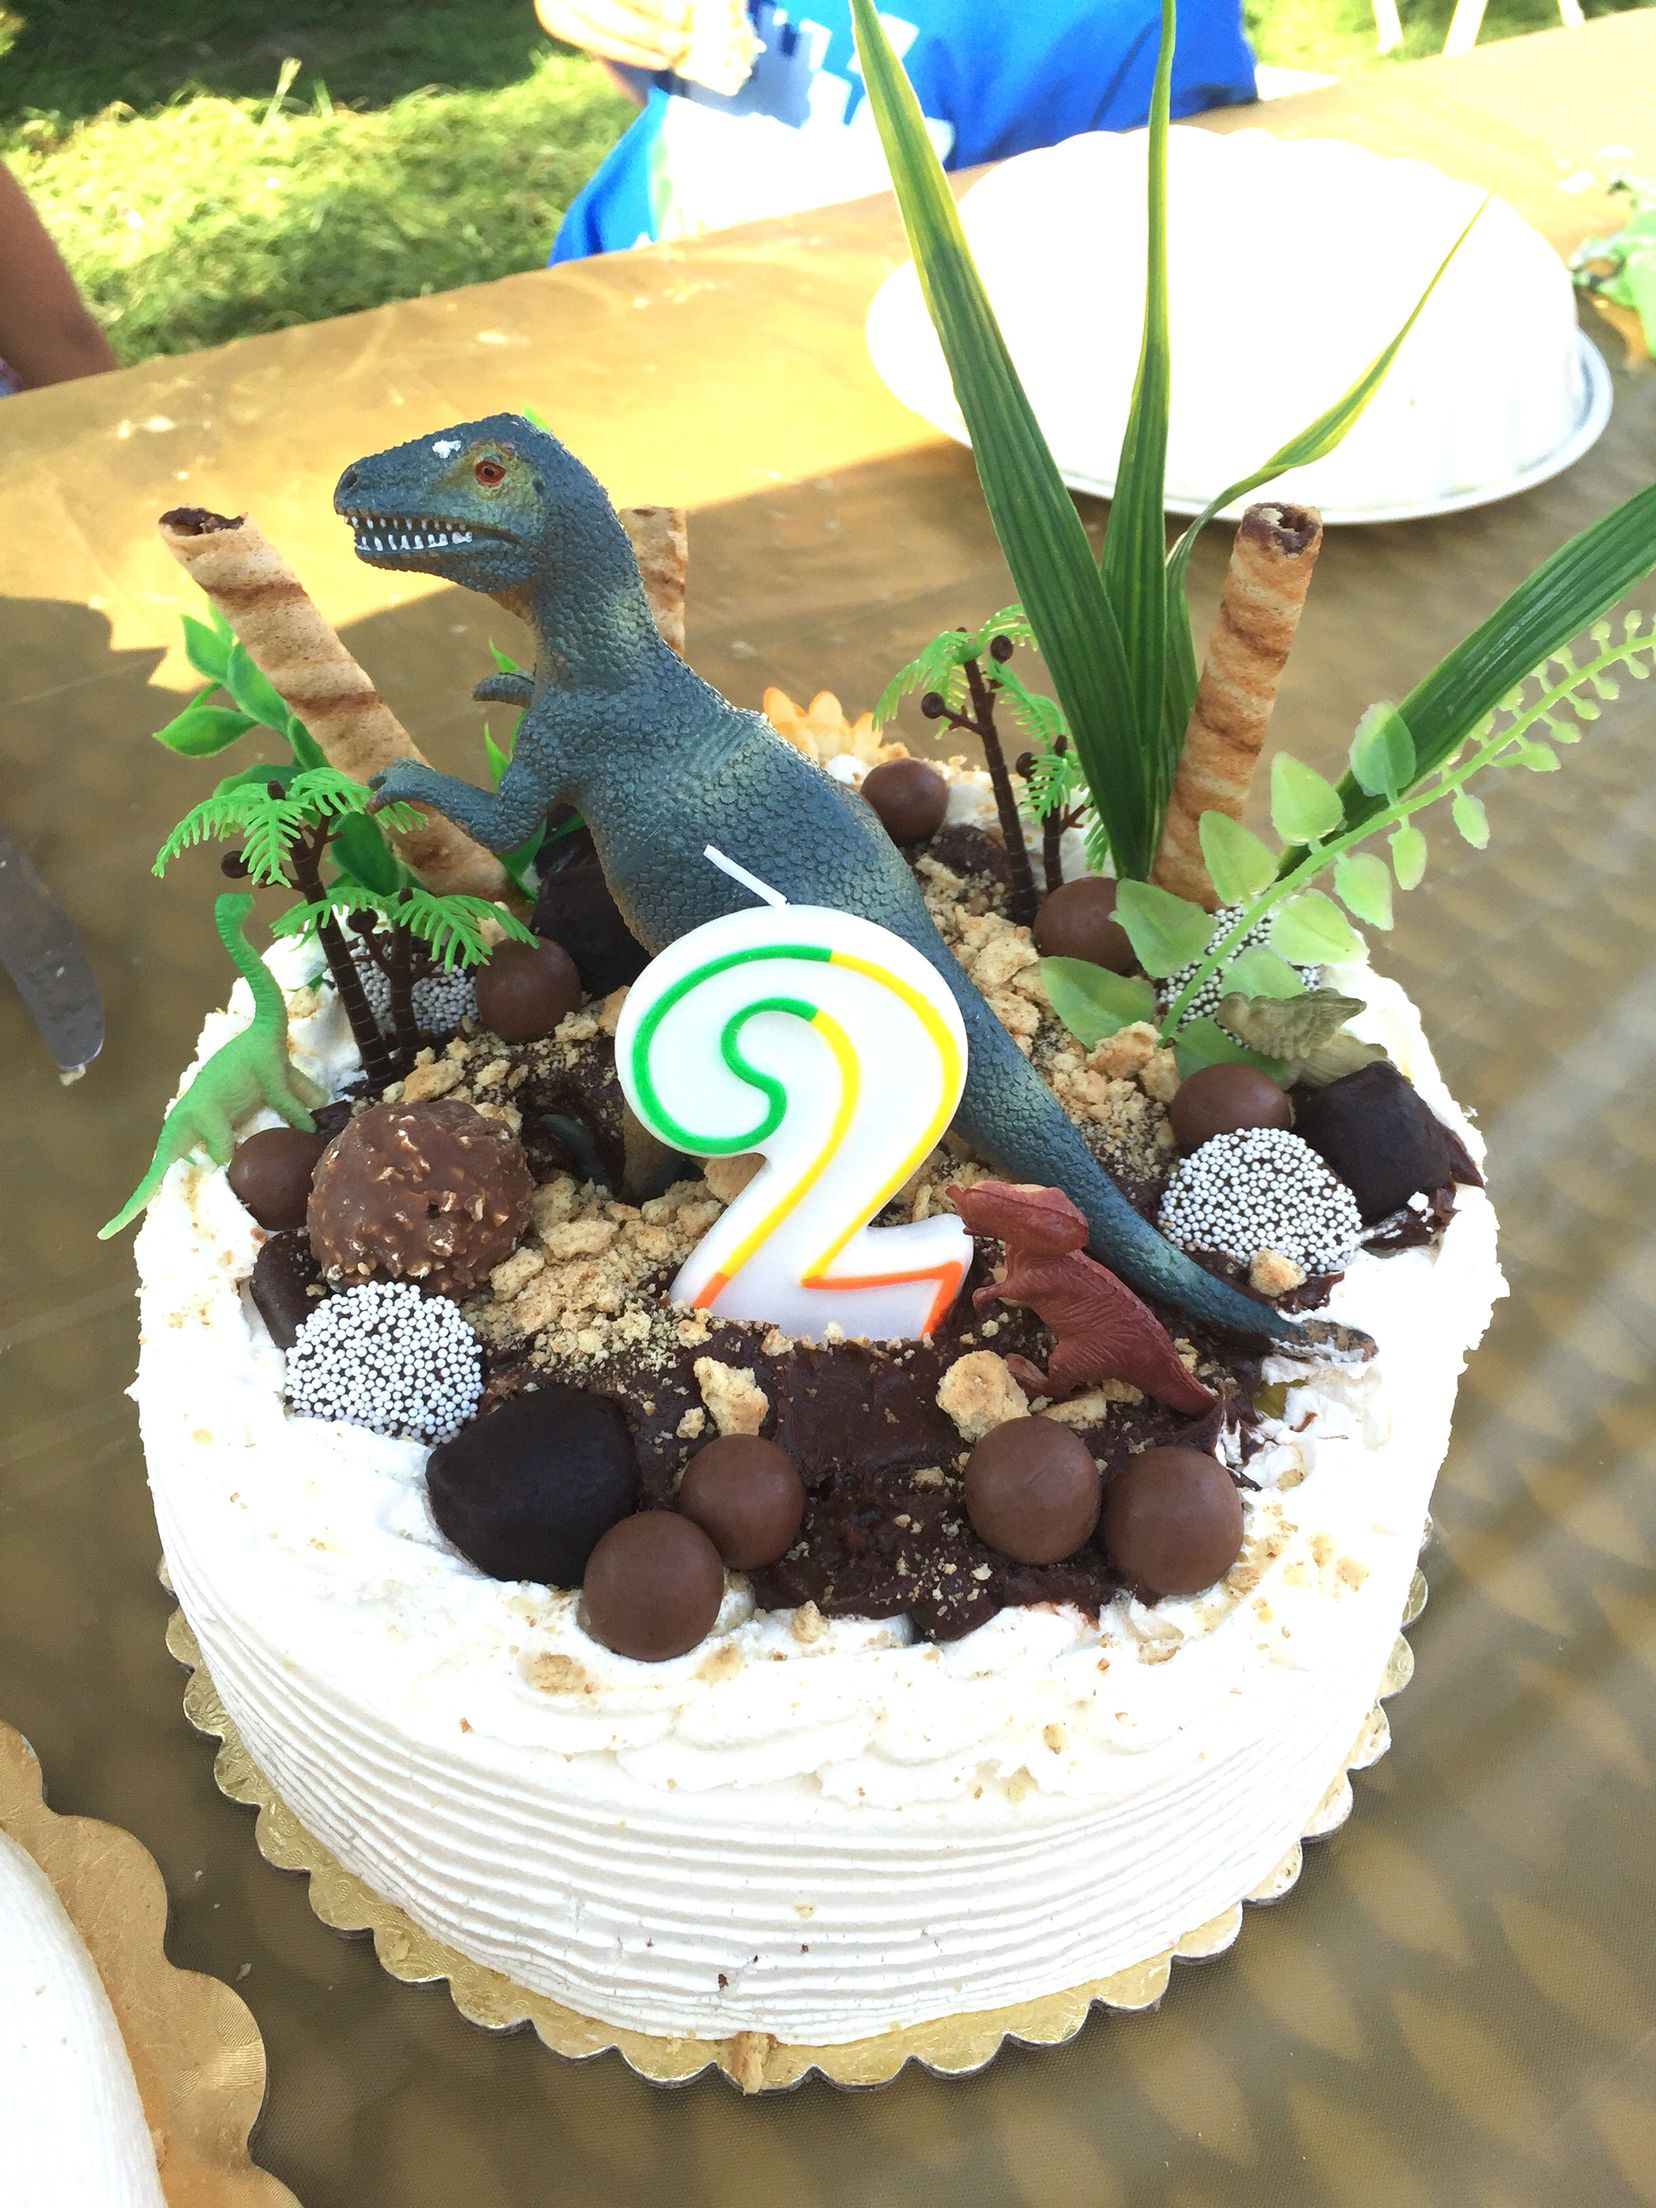 How To Make A Rainbow Birthday Cake Novelty Birthday Cakes Dinosaur Birthday Cakes Childrens Birthday Cakes Rainbow Birthday Cake